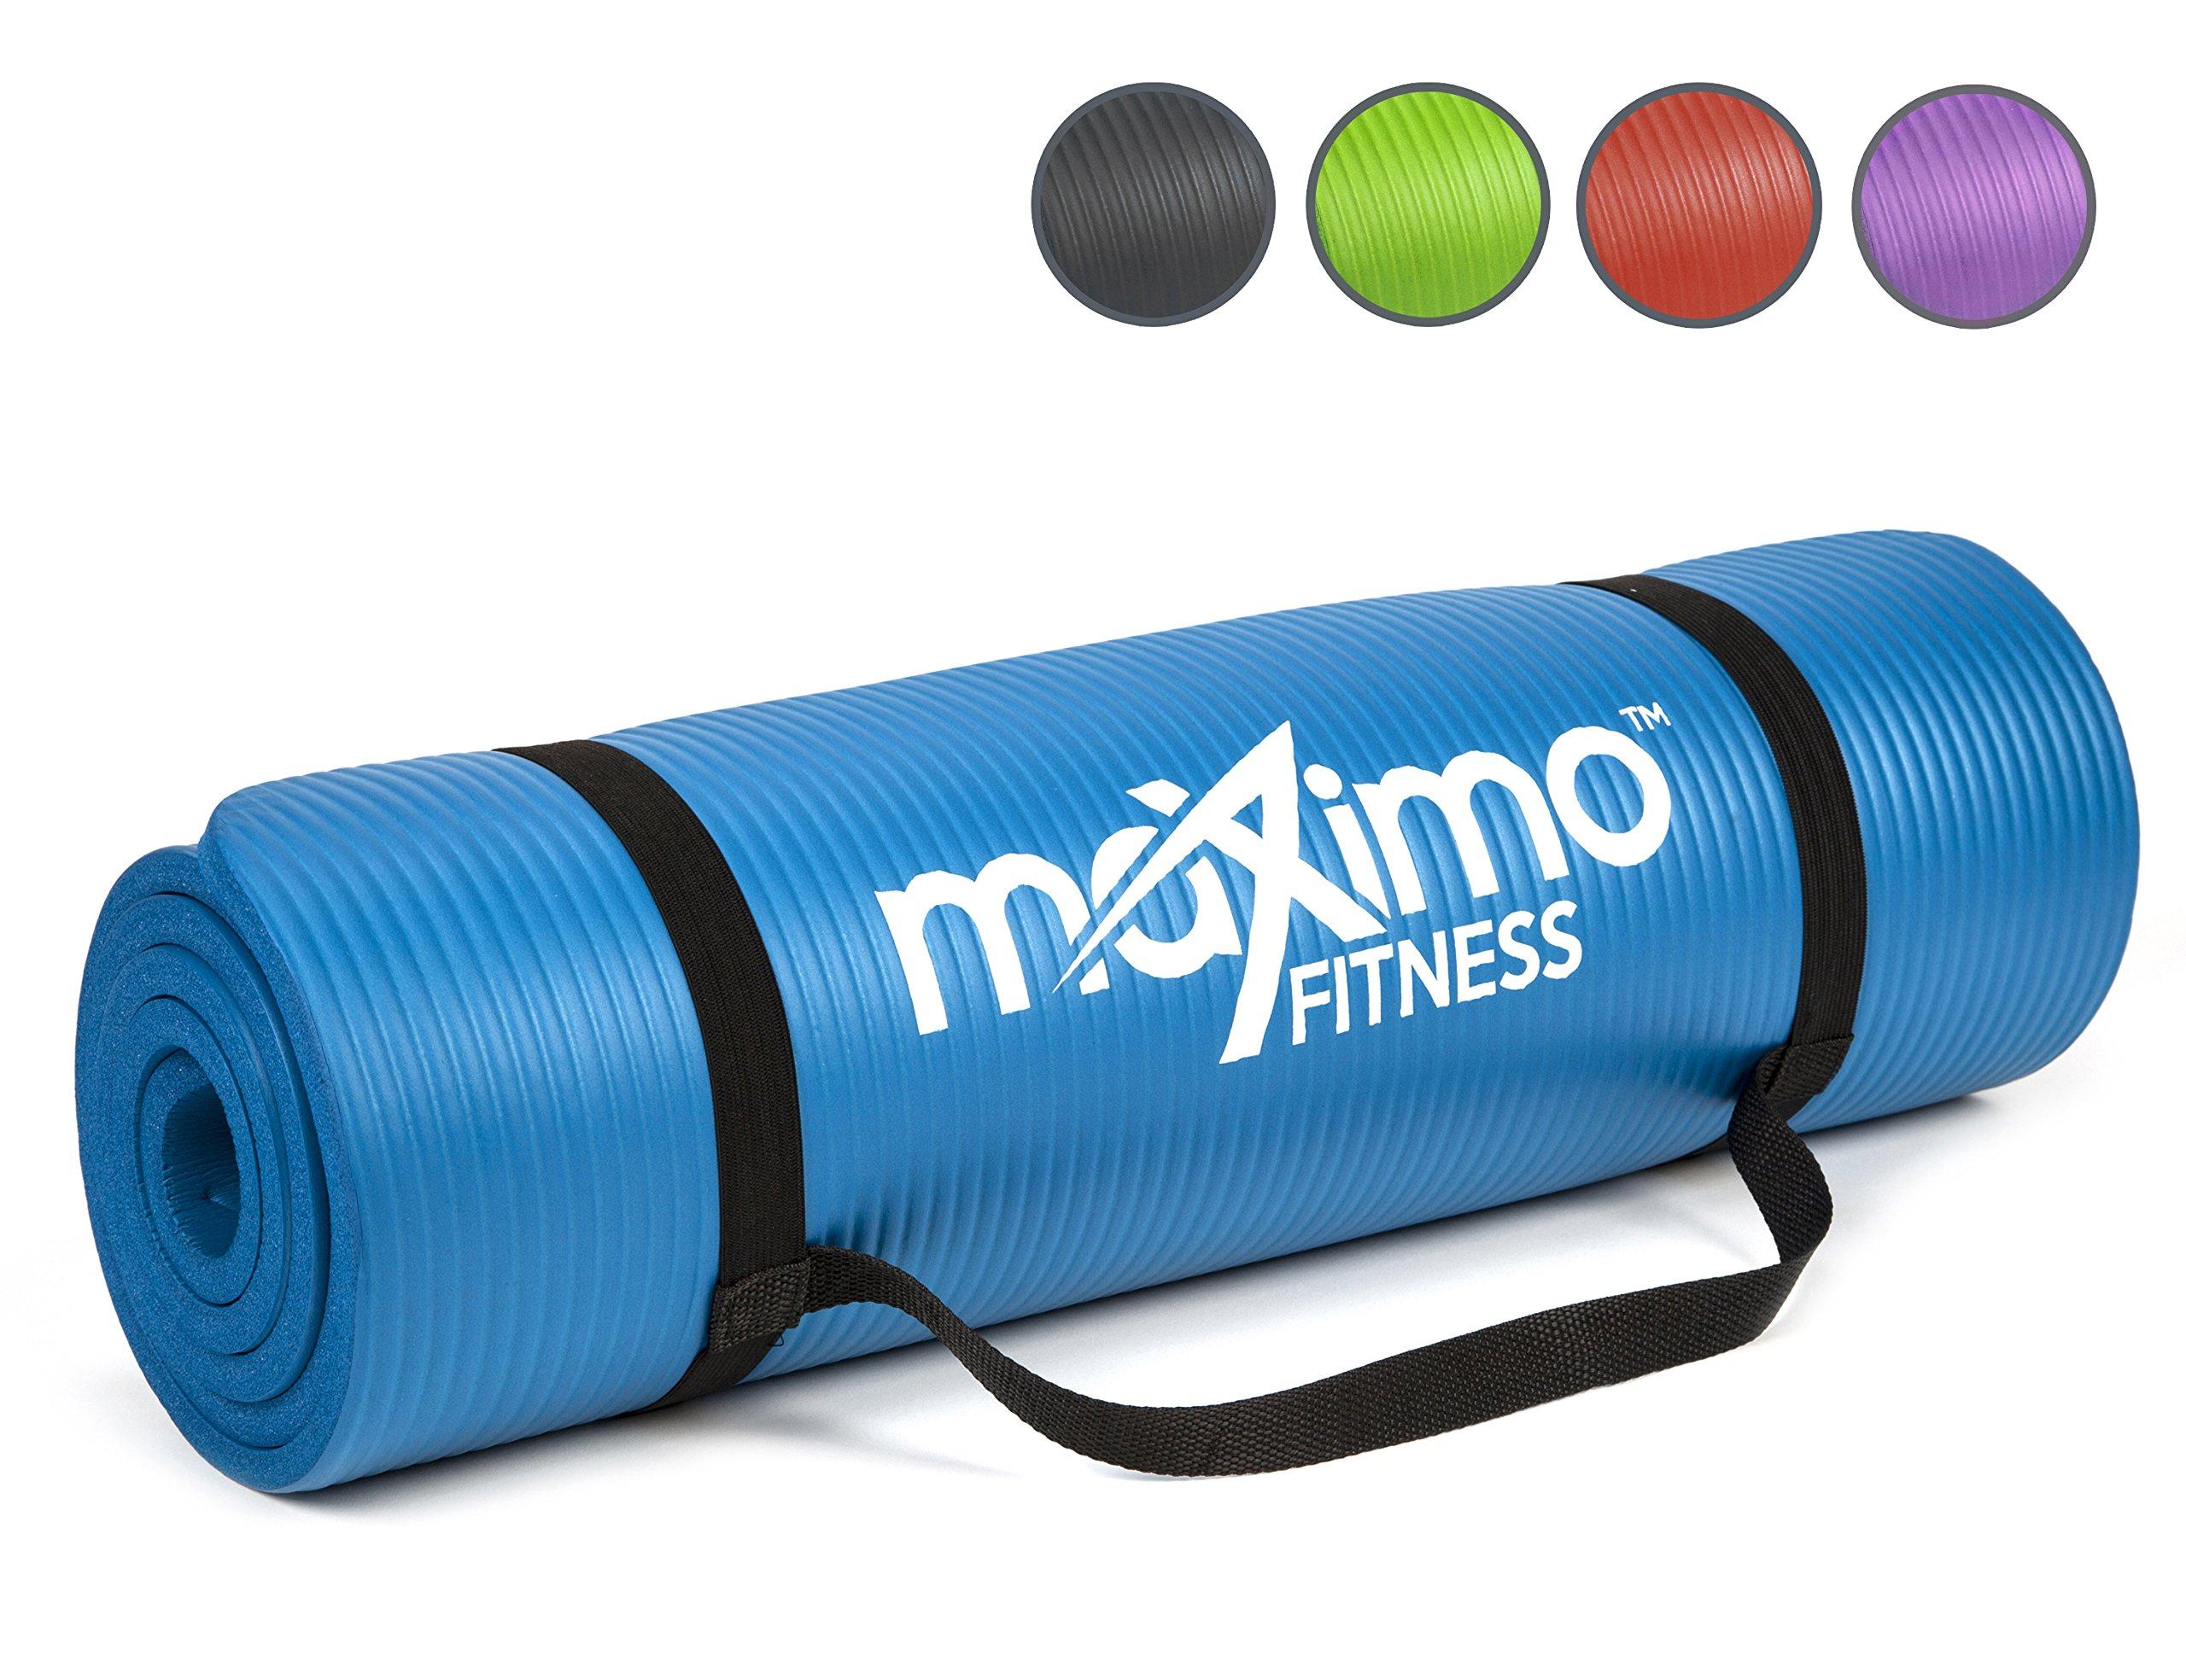 Maximo Fitness Colchoneta de Ejercicios - 183cm de Longitud x 60cm de Ancho x 1,